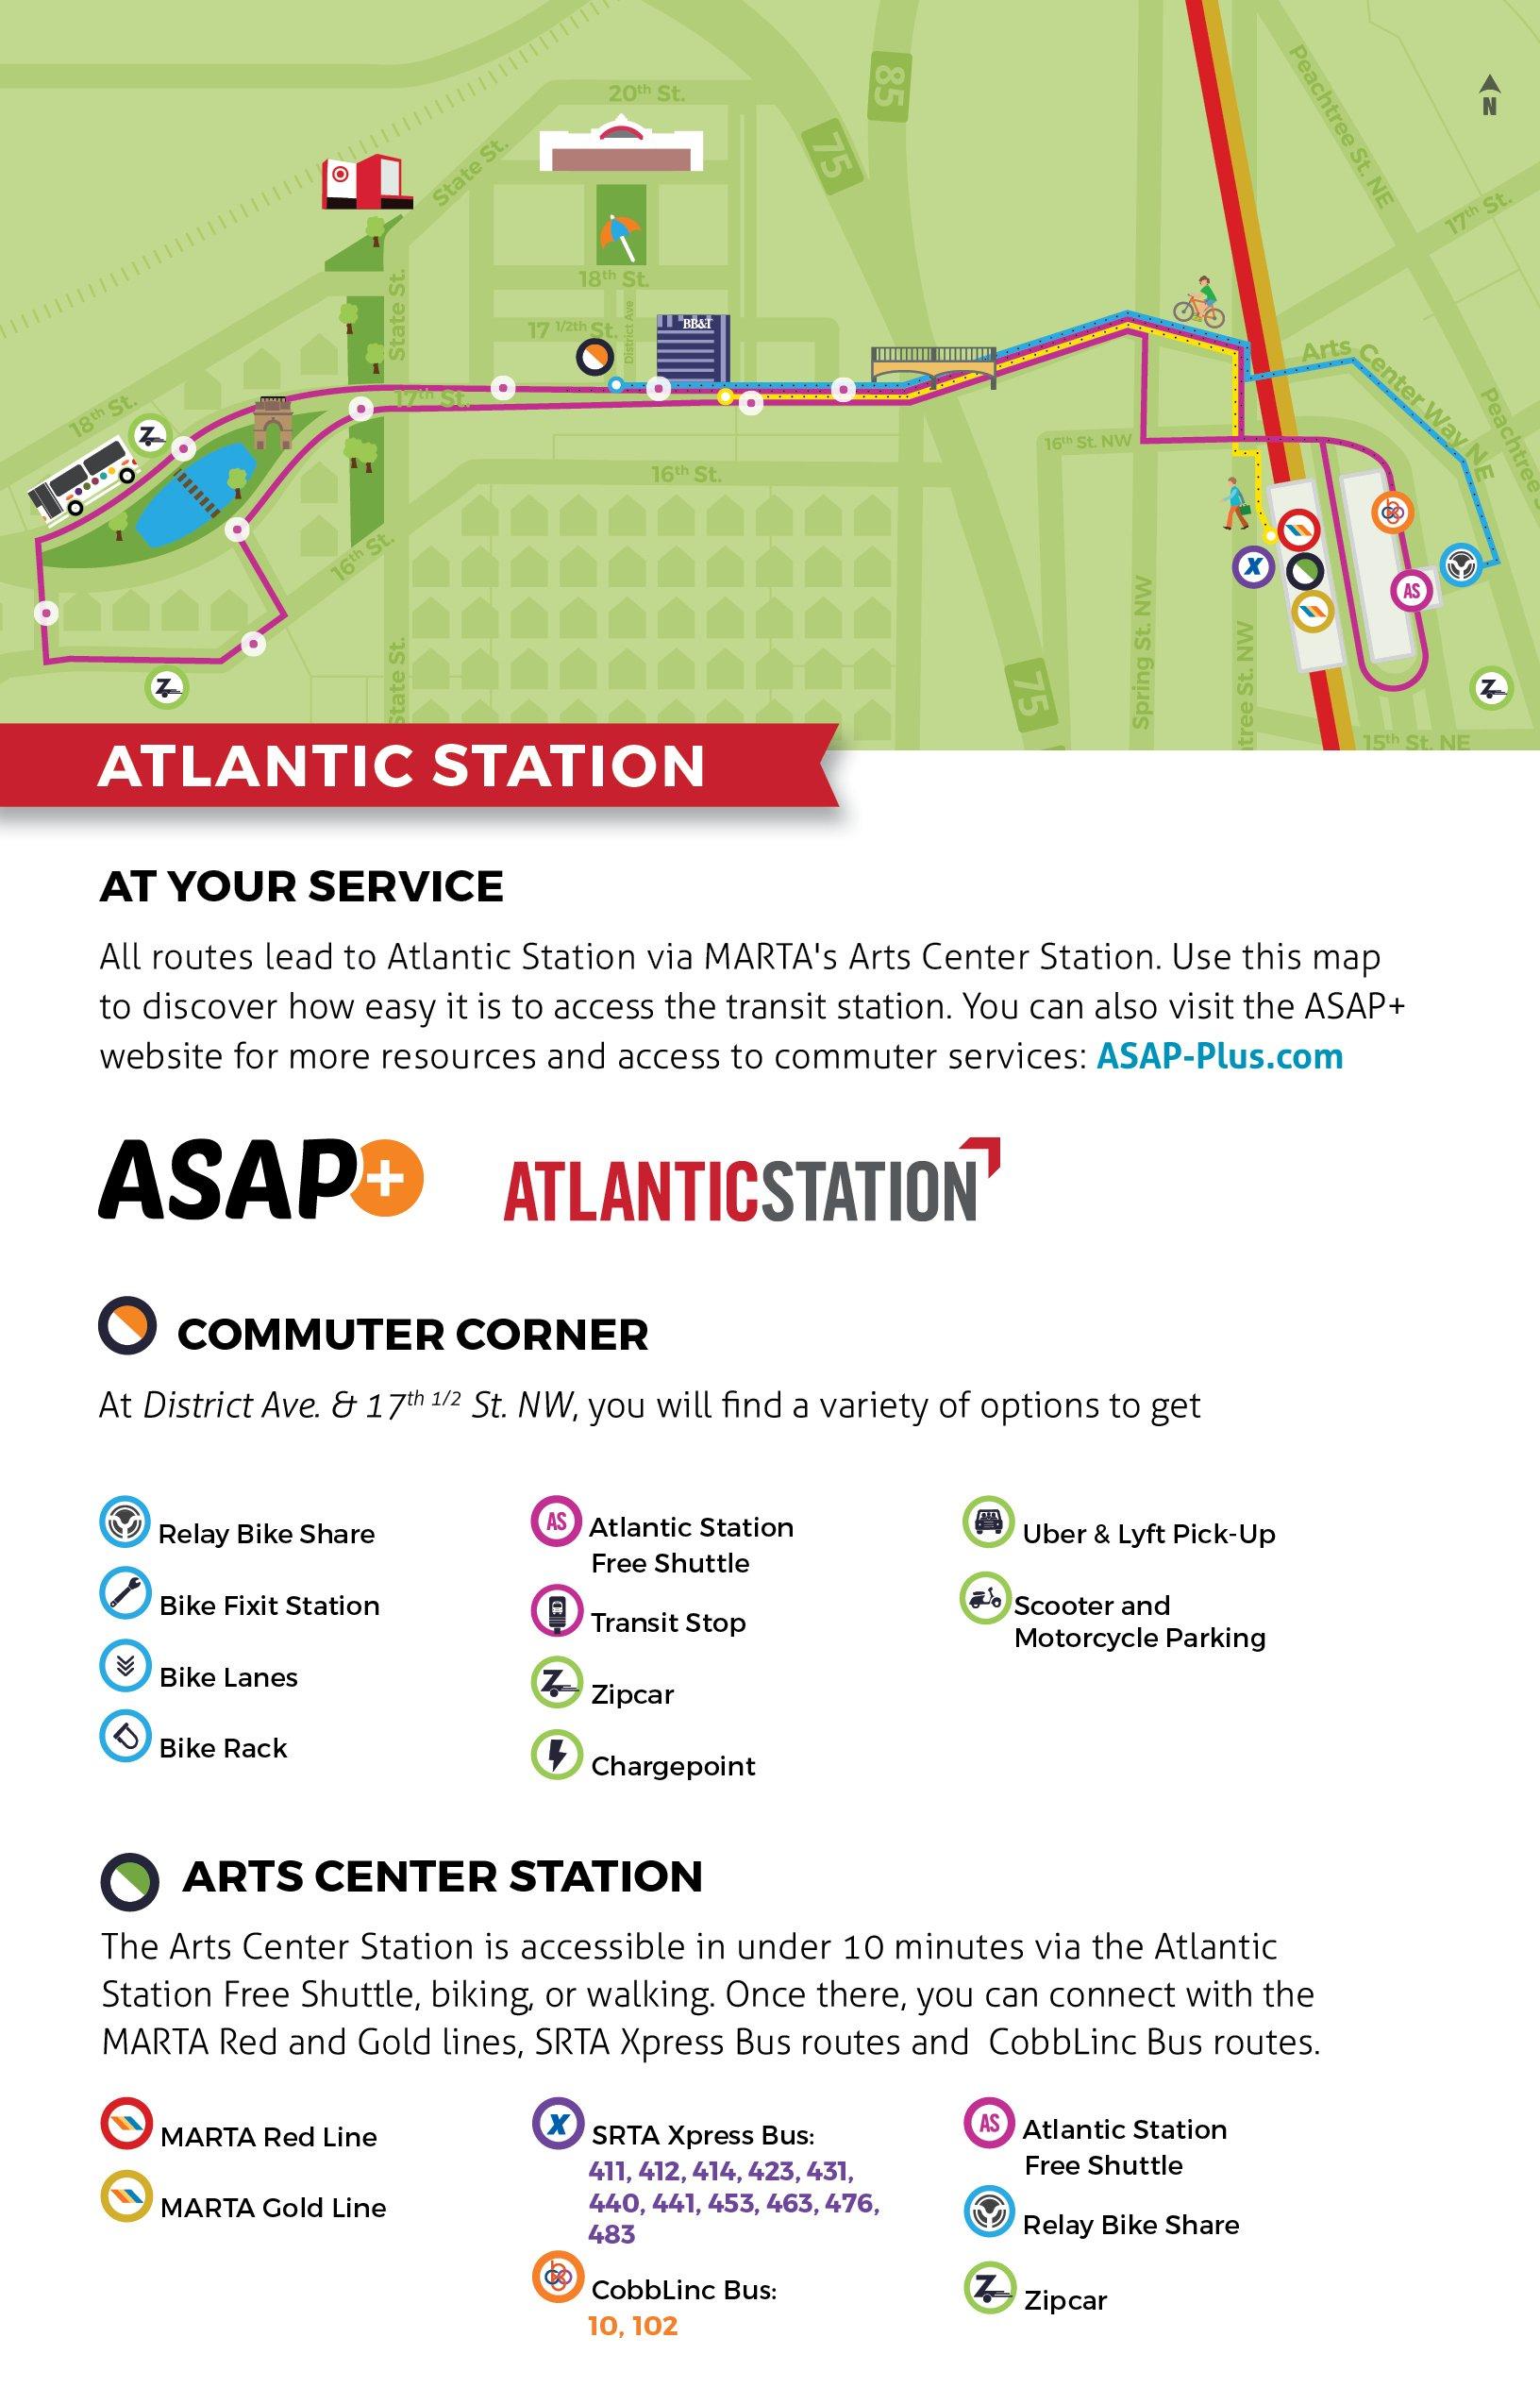 Atlantic Station Map